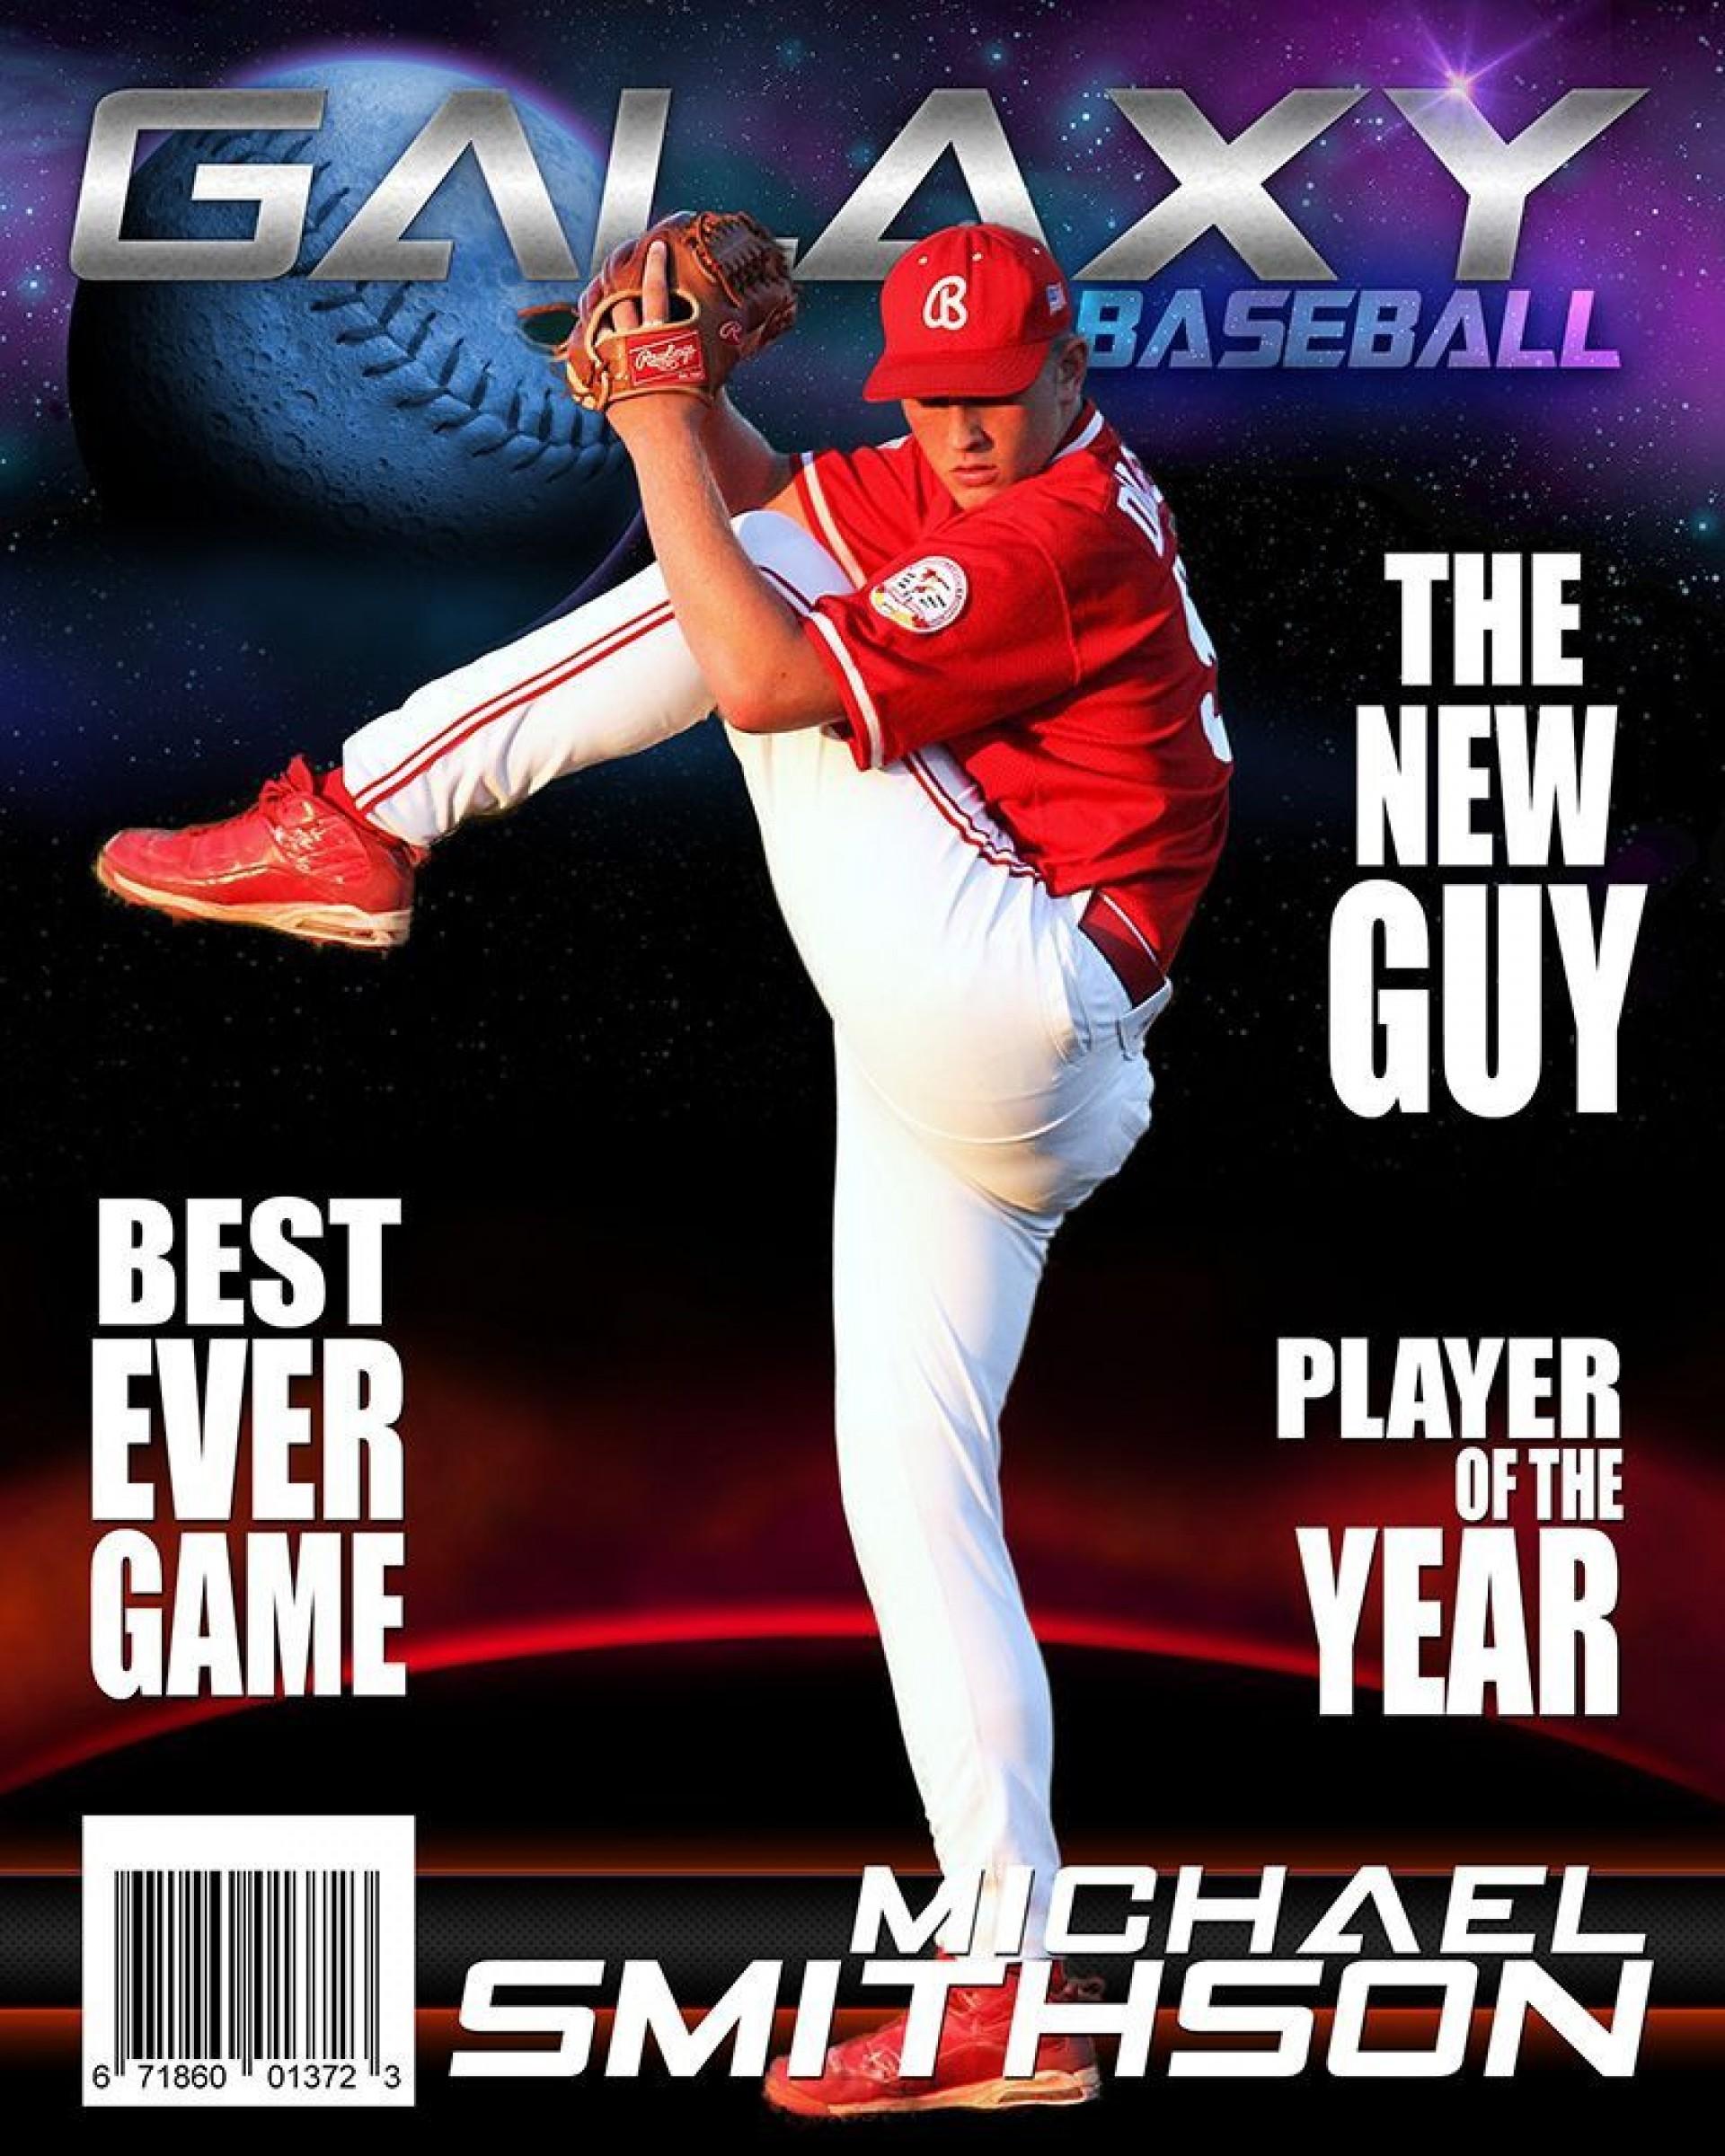 002 Astounding Photoshop Baseball Magazine Cover Template Concept 1920